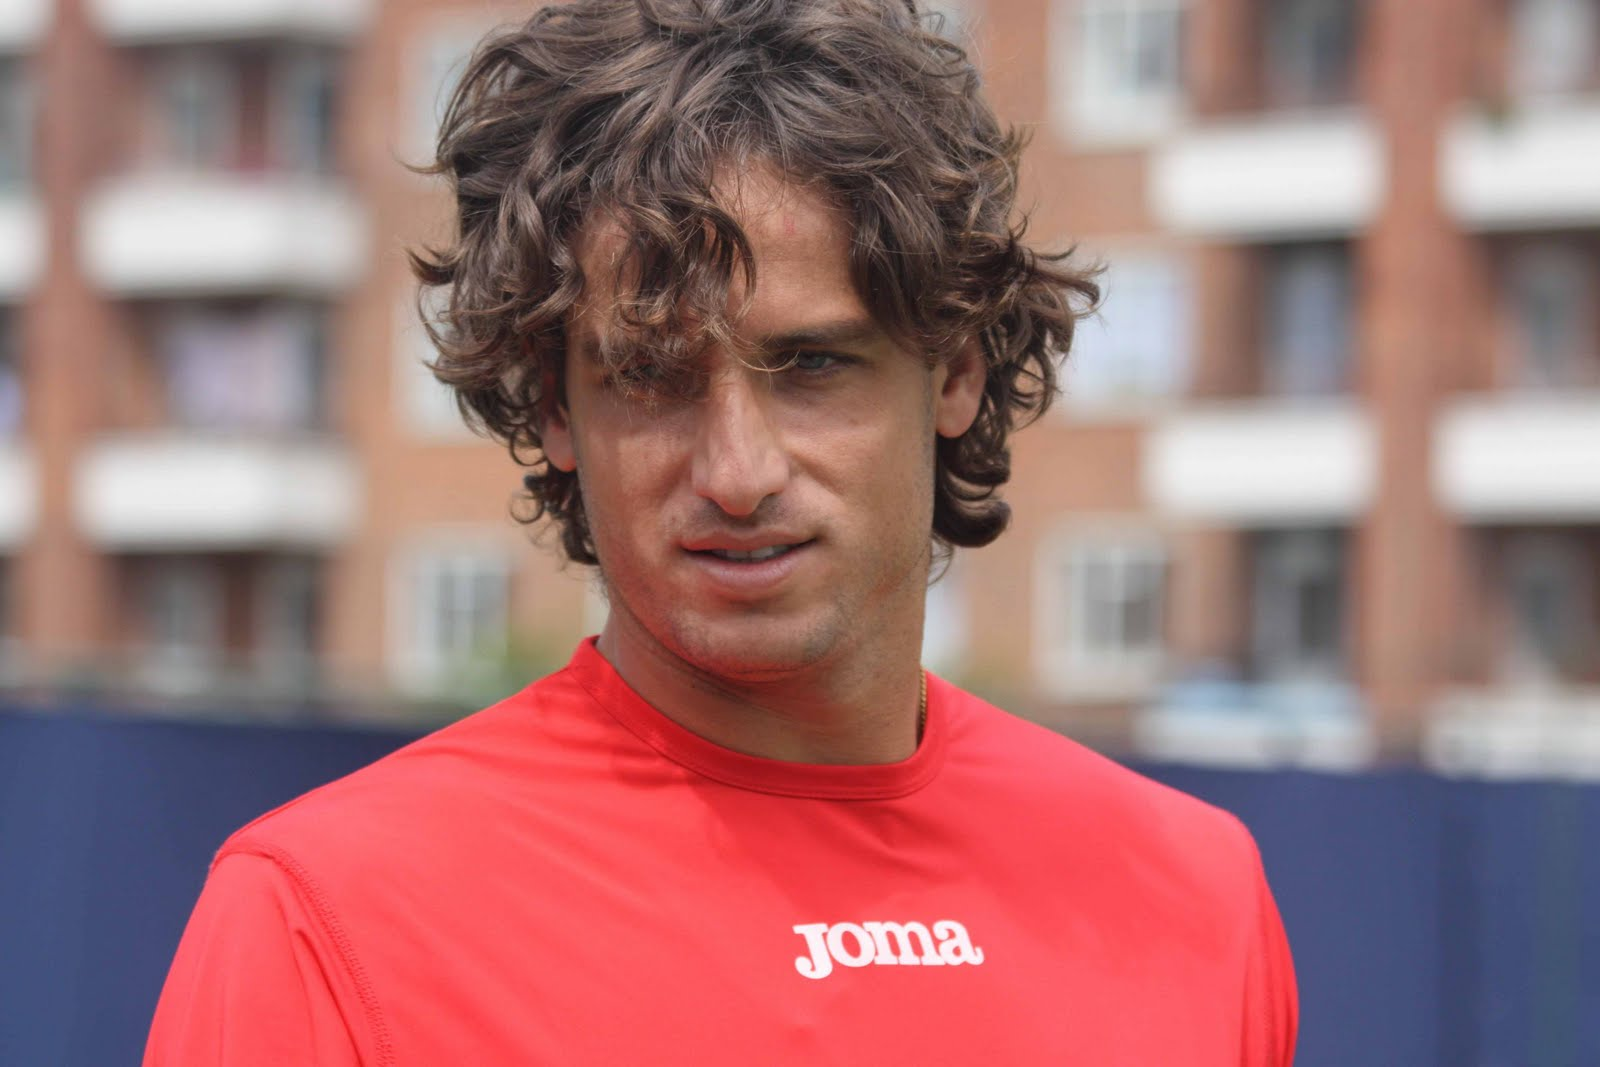 http://1.bp.blogspot.com/-QRgbXPpYjvM/TiVeV9p5rBI/AAAAAAAADNw/_DN5EP2BIvk/s1600/feliciano-lopez-haircut-2011-2.jpg